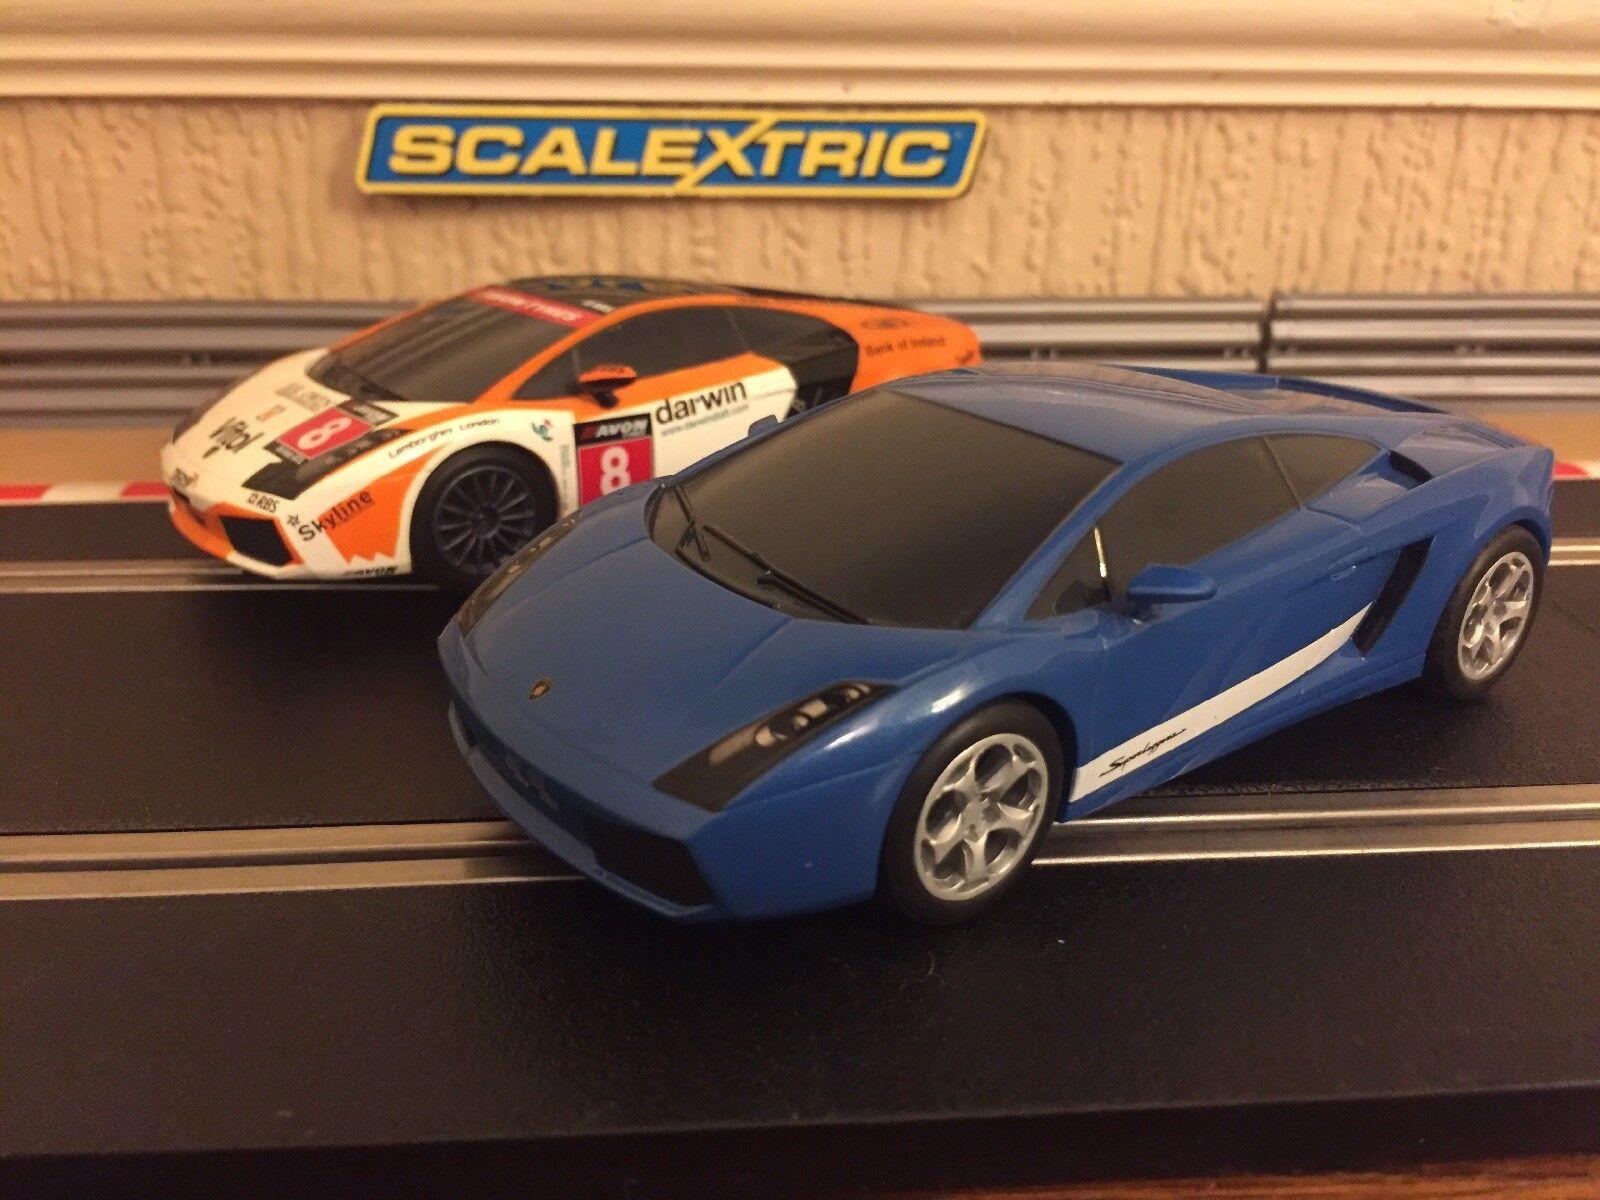 Scalextric Lamborghini Gallardo Cars x2 Fully Serviced & New Braids Fitted VGC